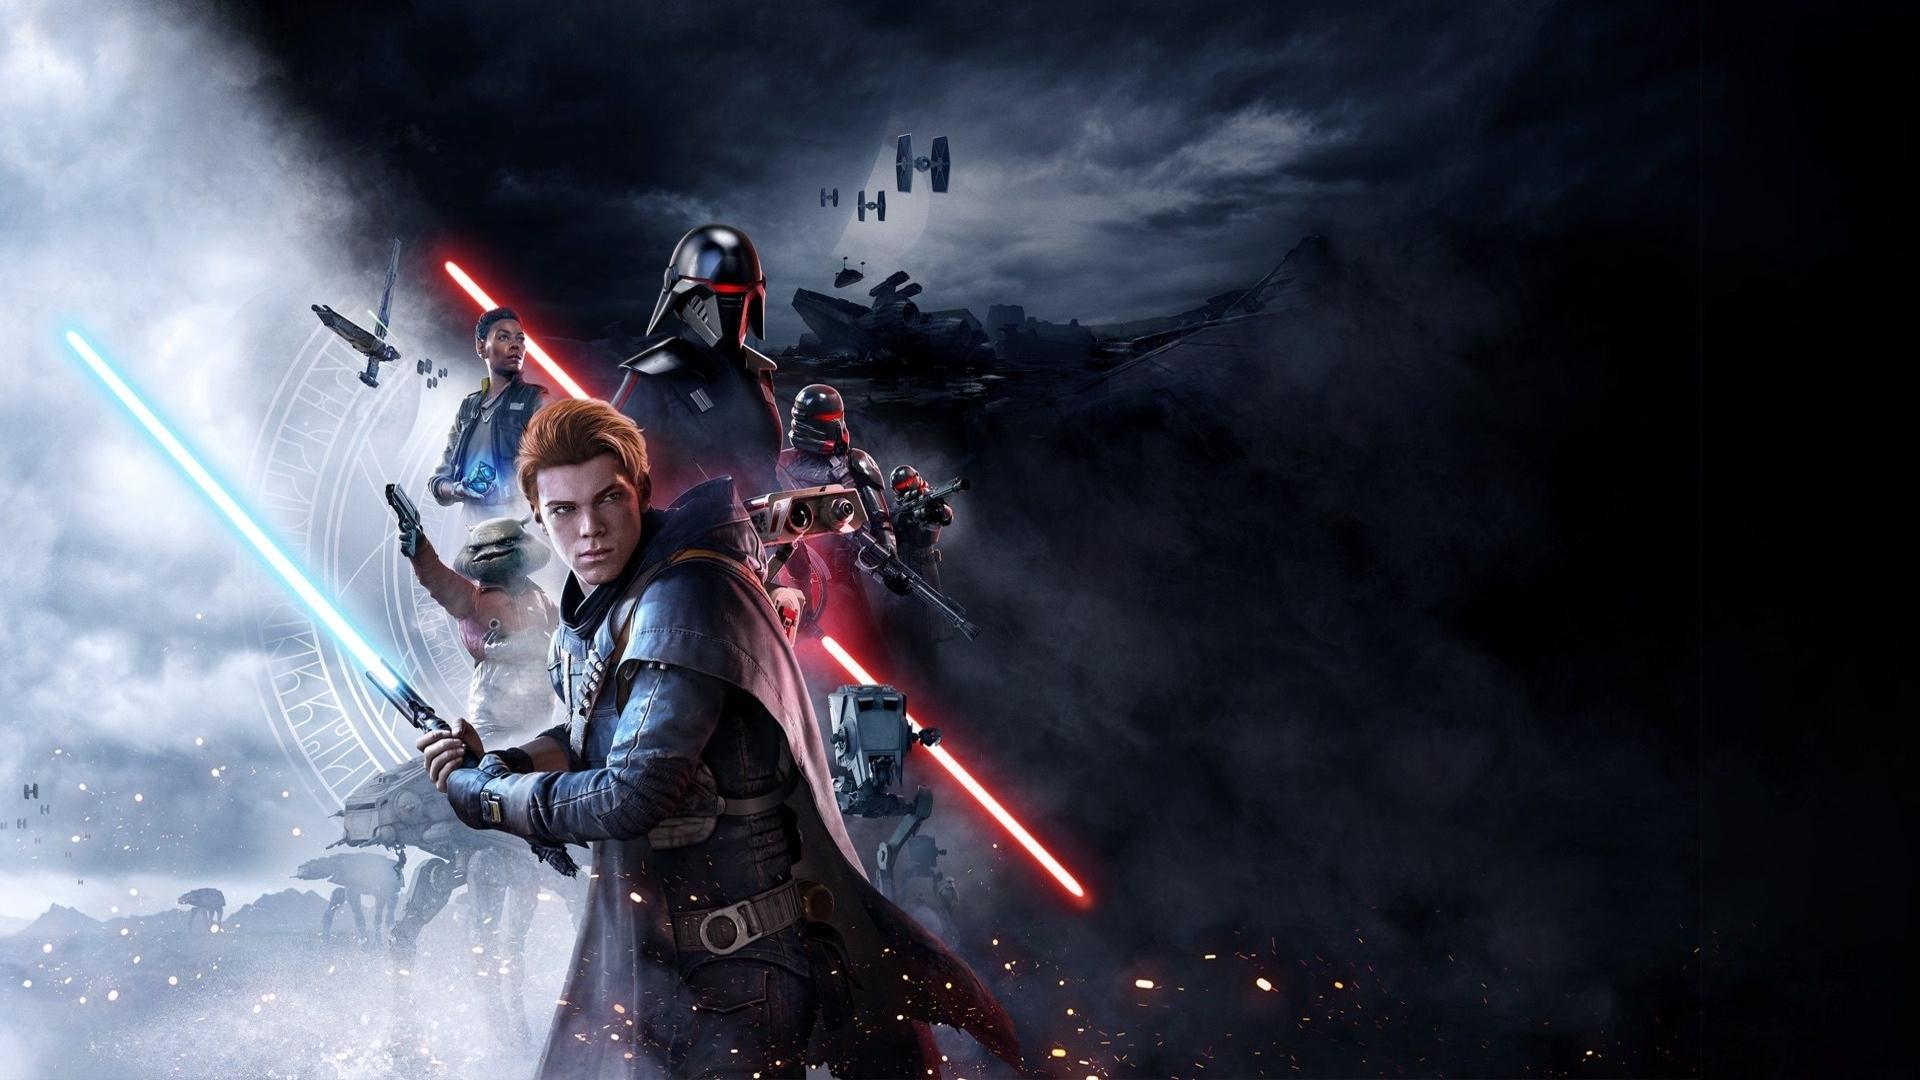 48 Star Wars Jedi Fallen Order Hd Wallpapers Background Images